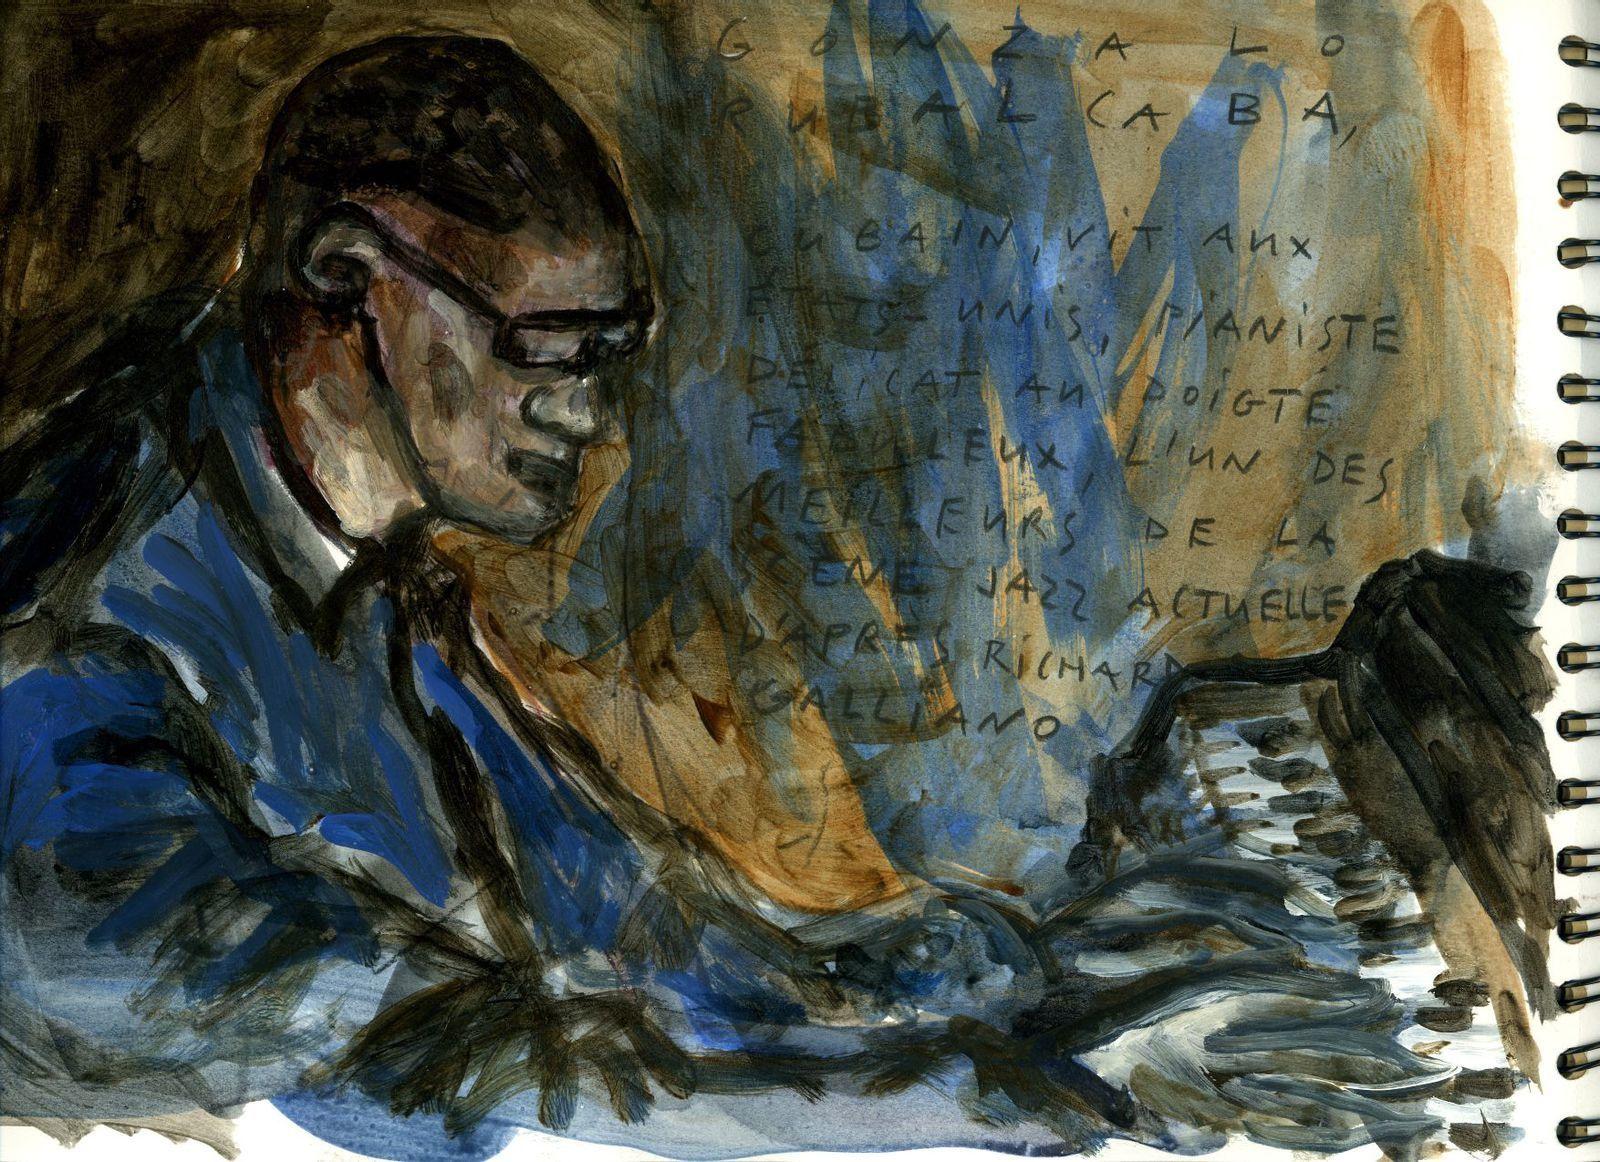 Gonzalo Rubalcaba, piano (acrylique)